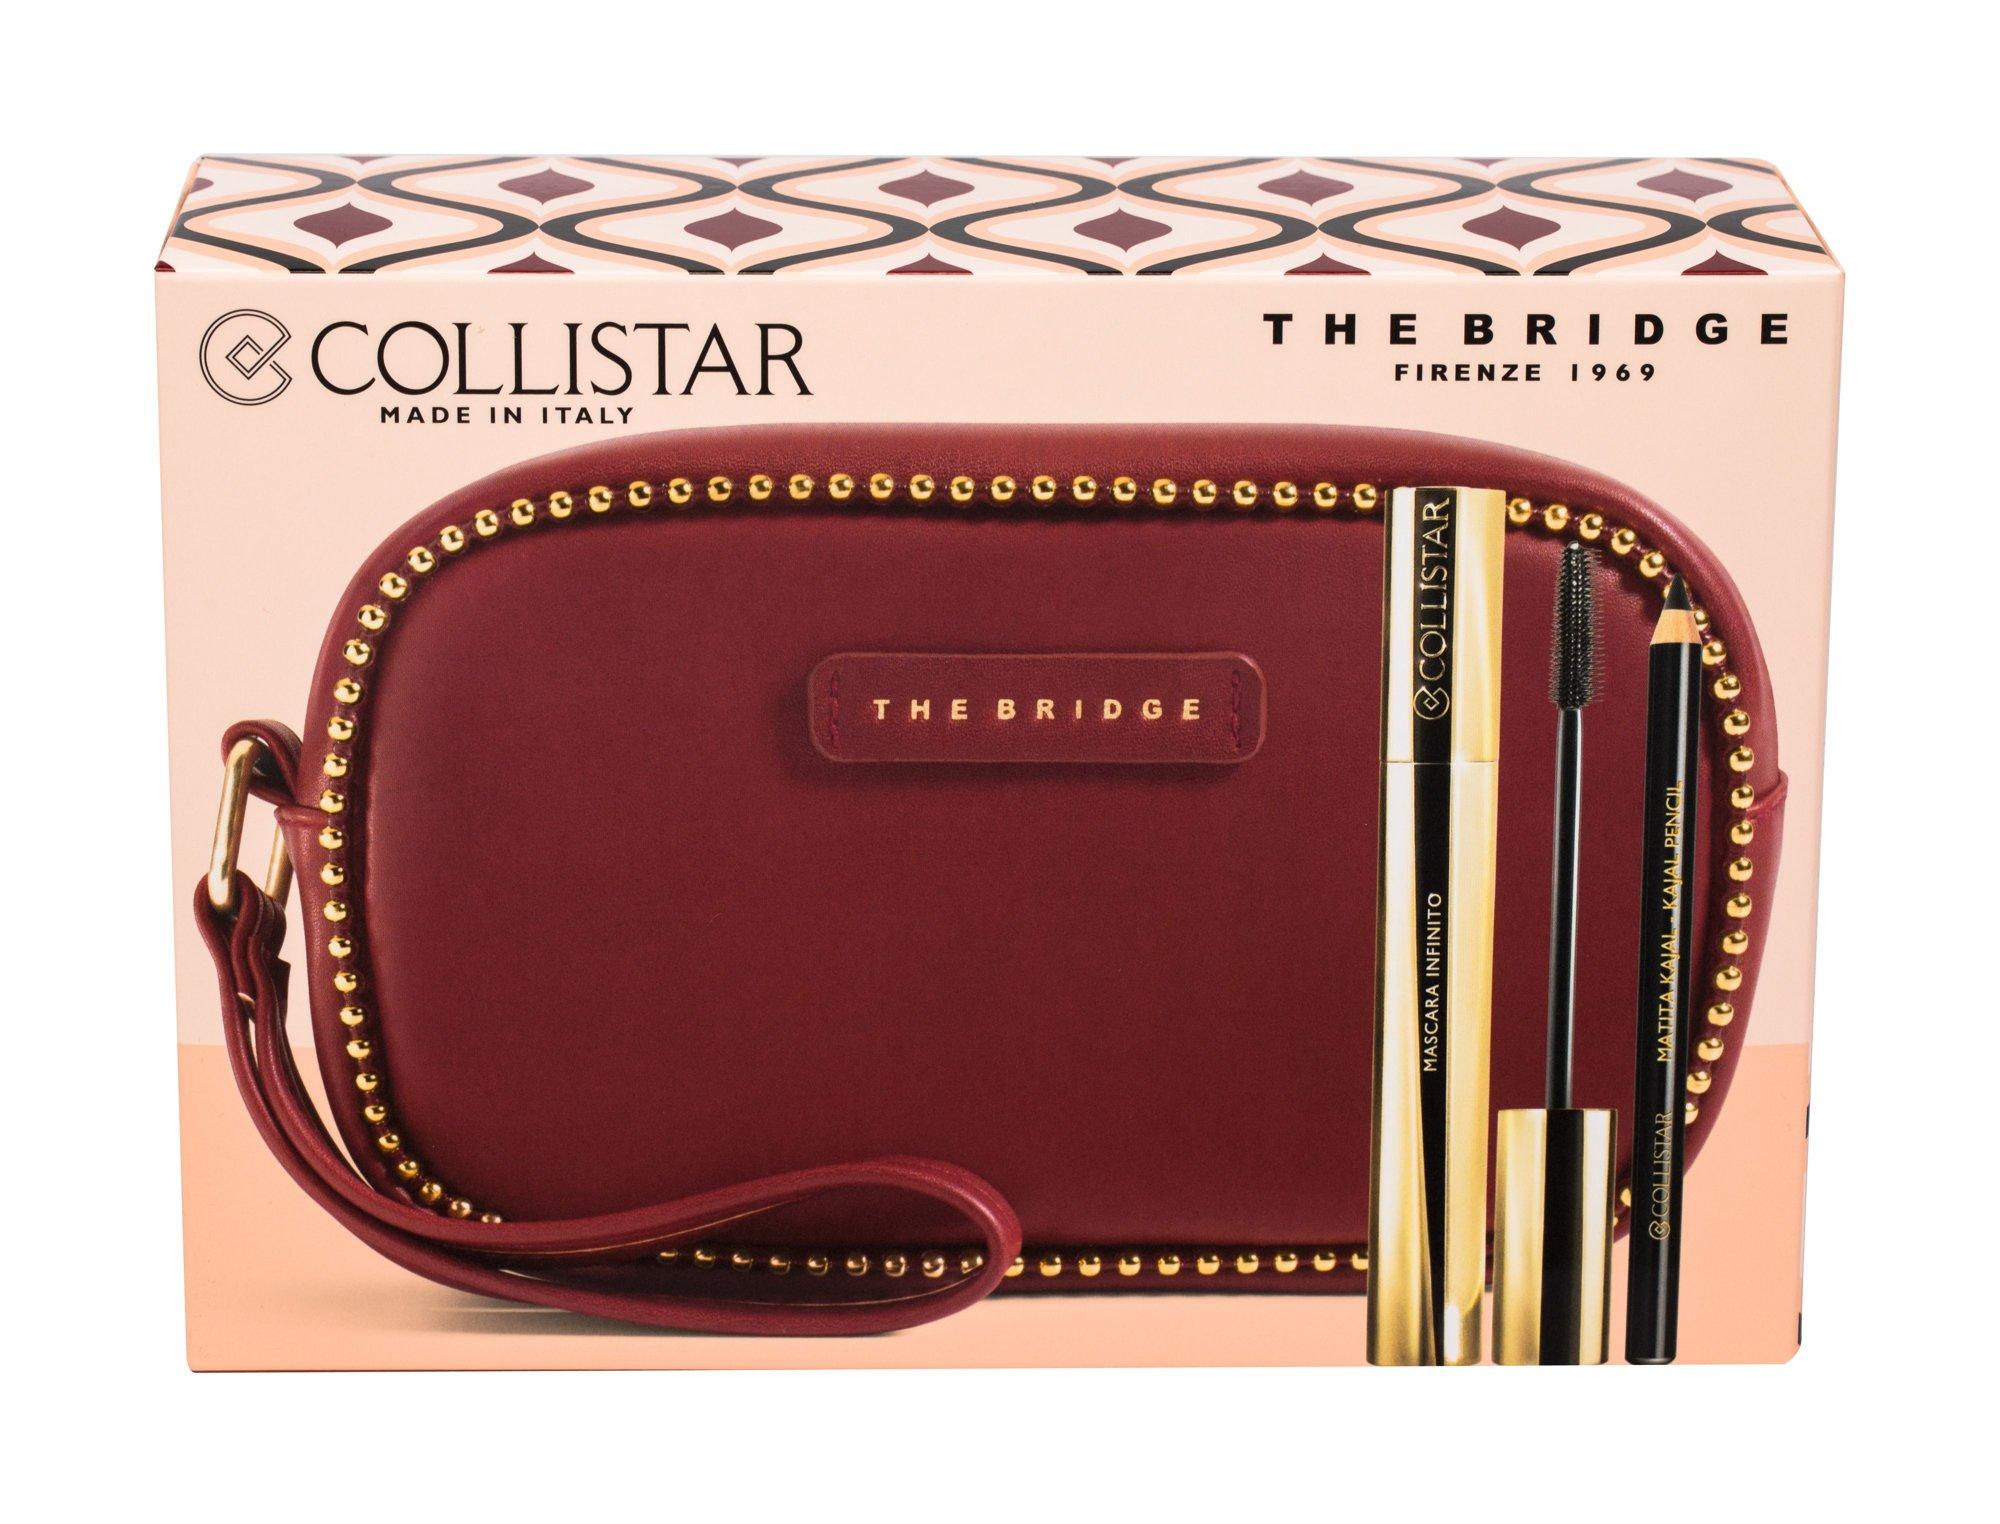 Collistar Infinito Mascara 11ml Extra Black